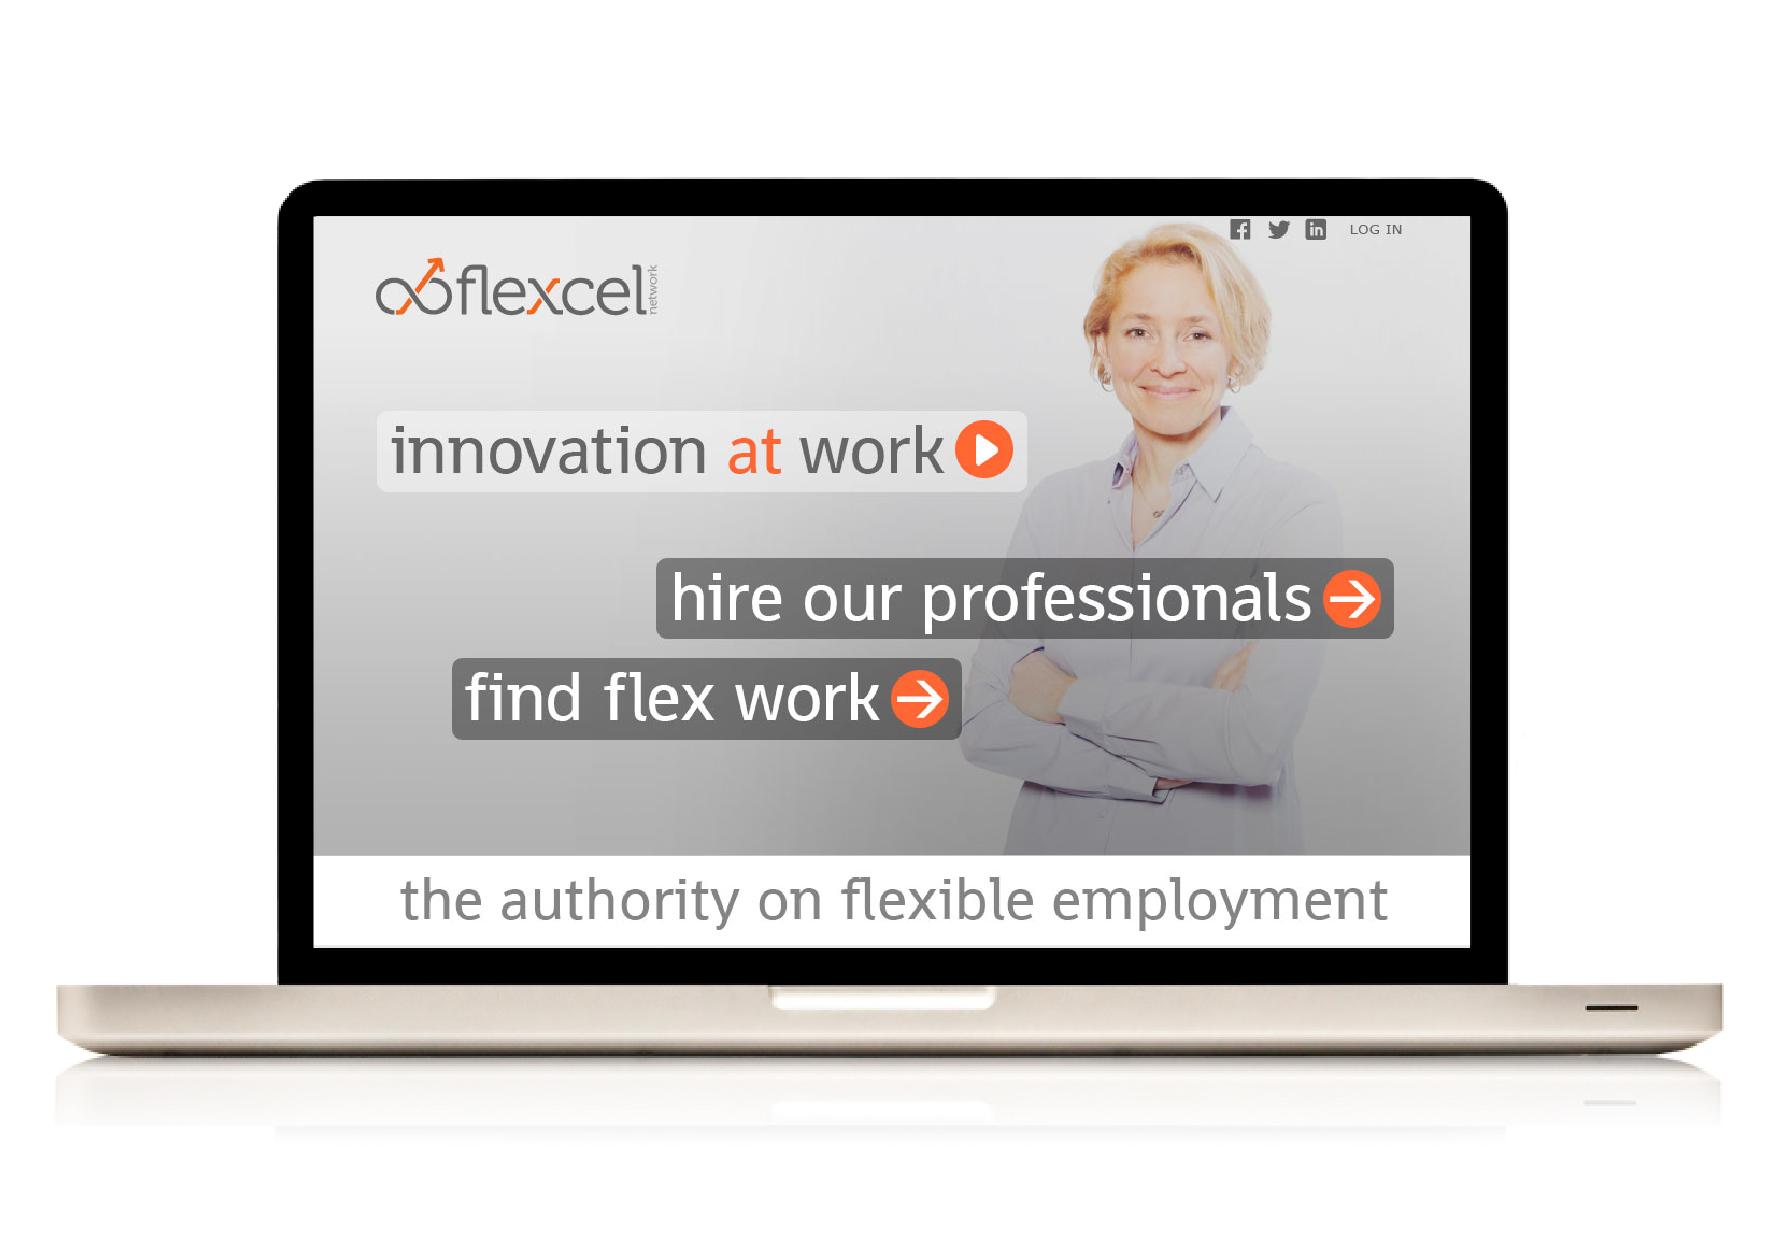 flexcel_laptop_new_home-01.jpg